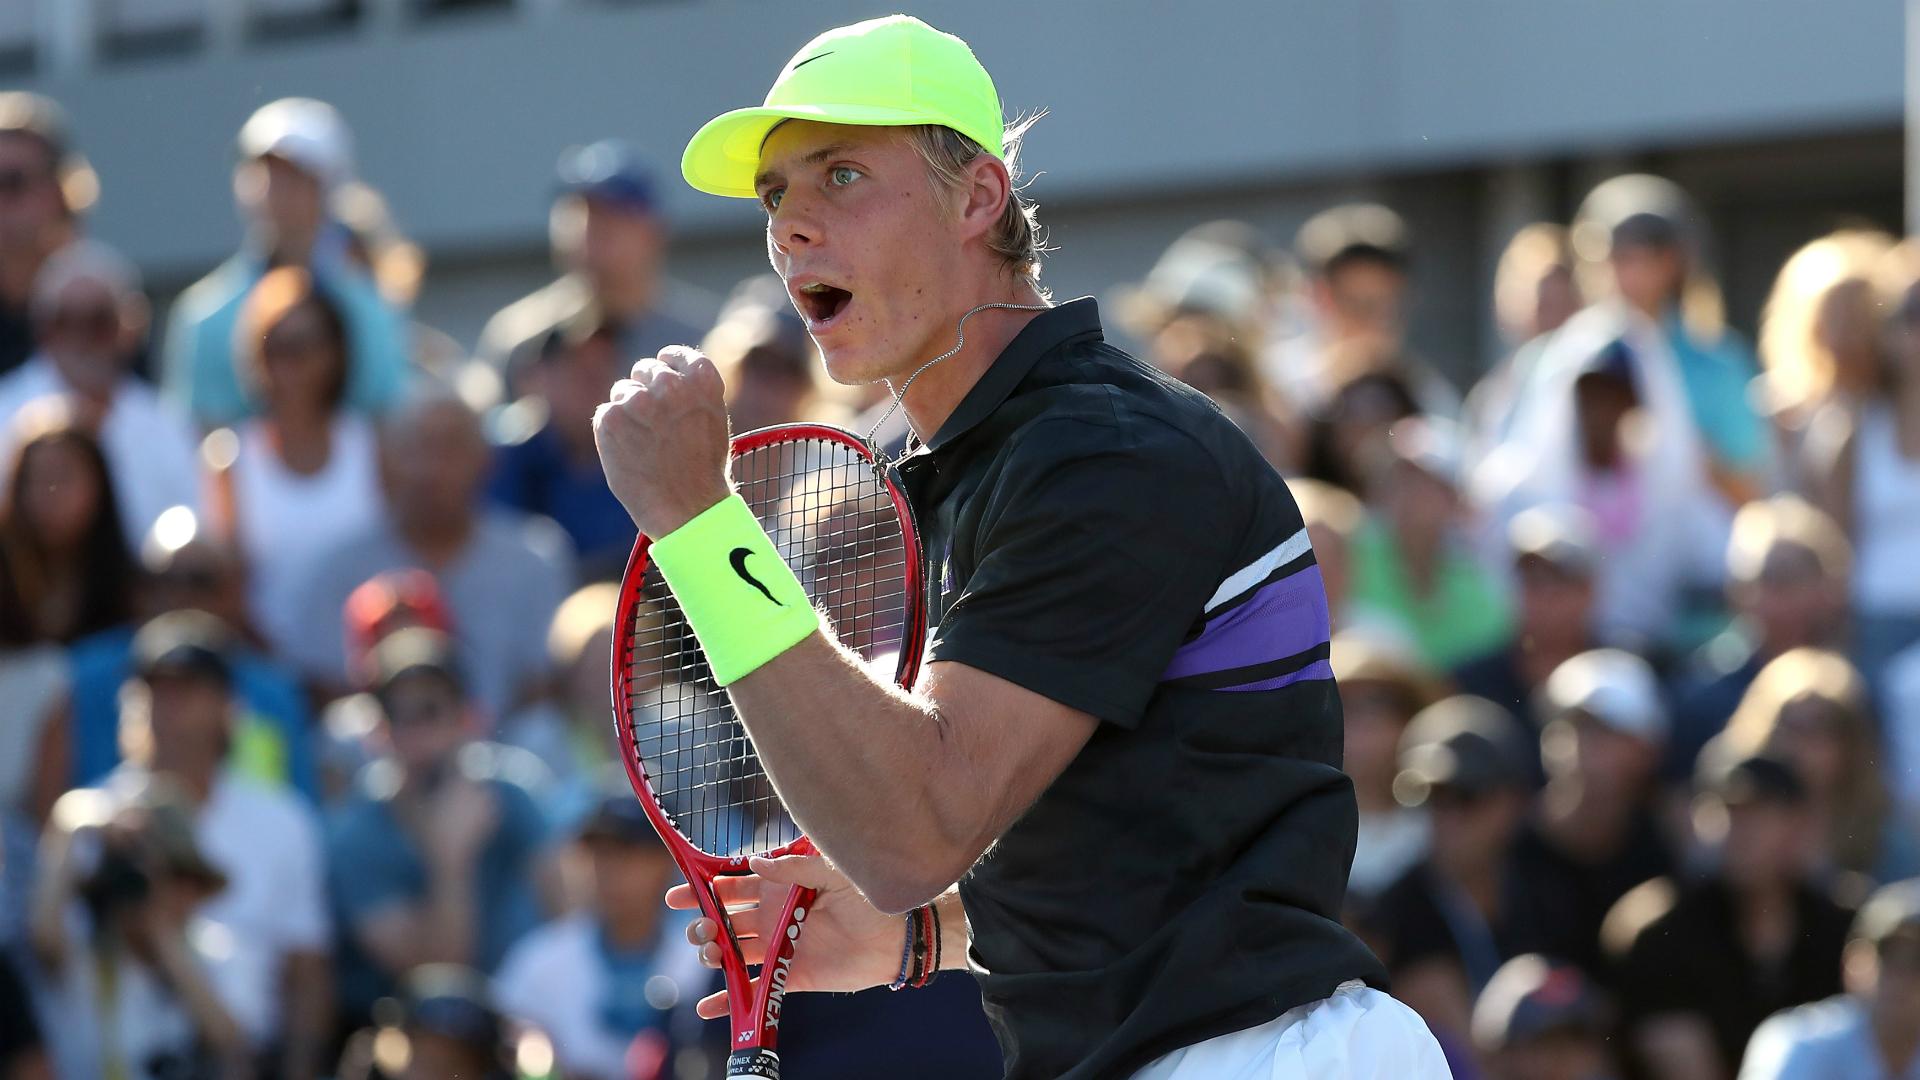 U.S. Open 2019: Denis Shapovalov ready for big stage, big battle with Gael Monfils